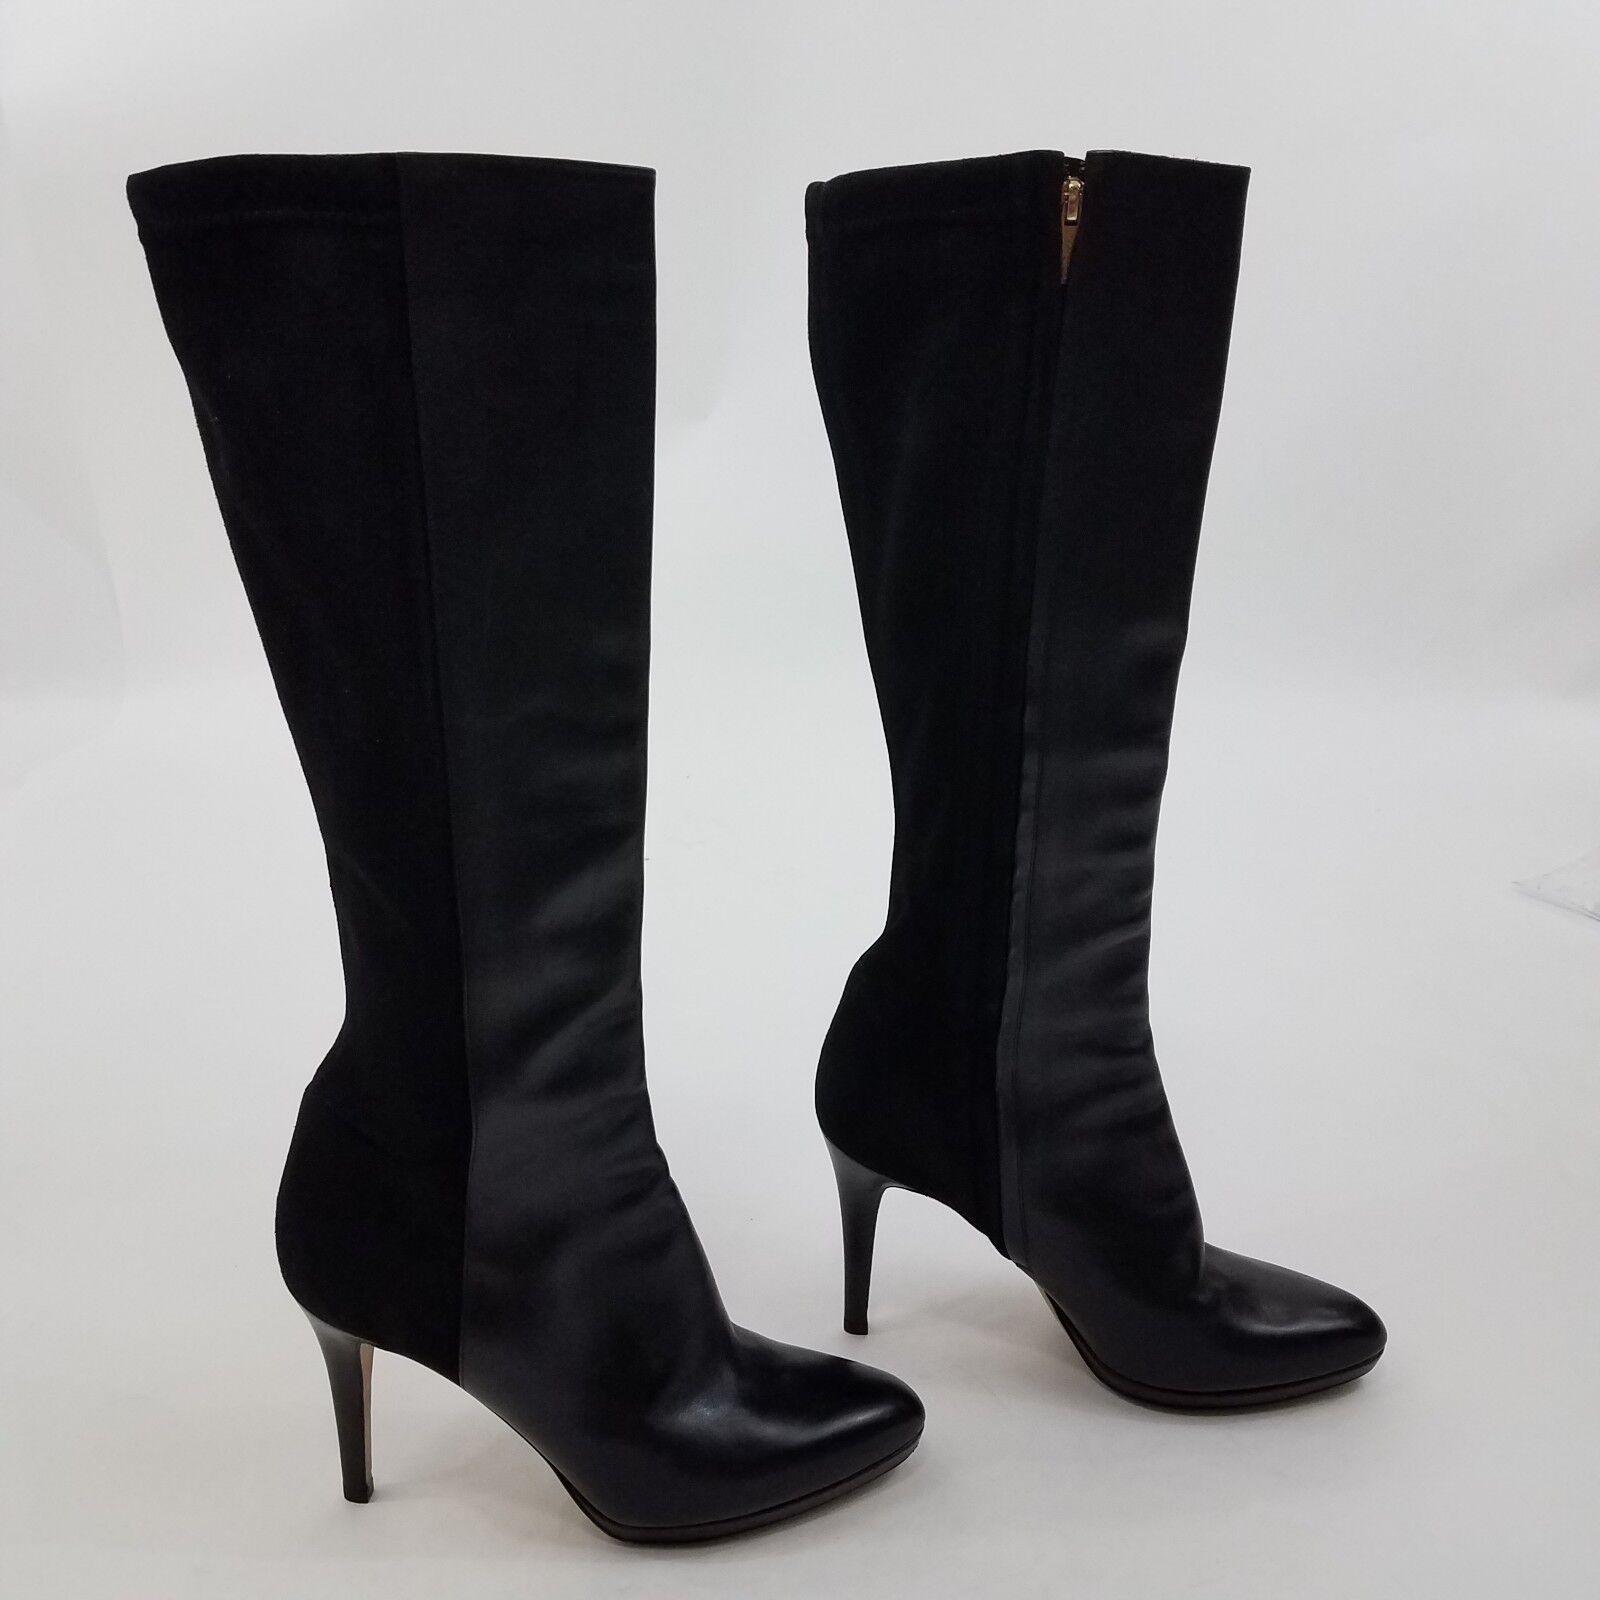 Jimmy Choo Boots Adele 38 8 Black Leather Heel Suede Zipper Pointy Toe Knee High